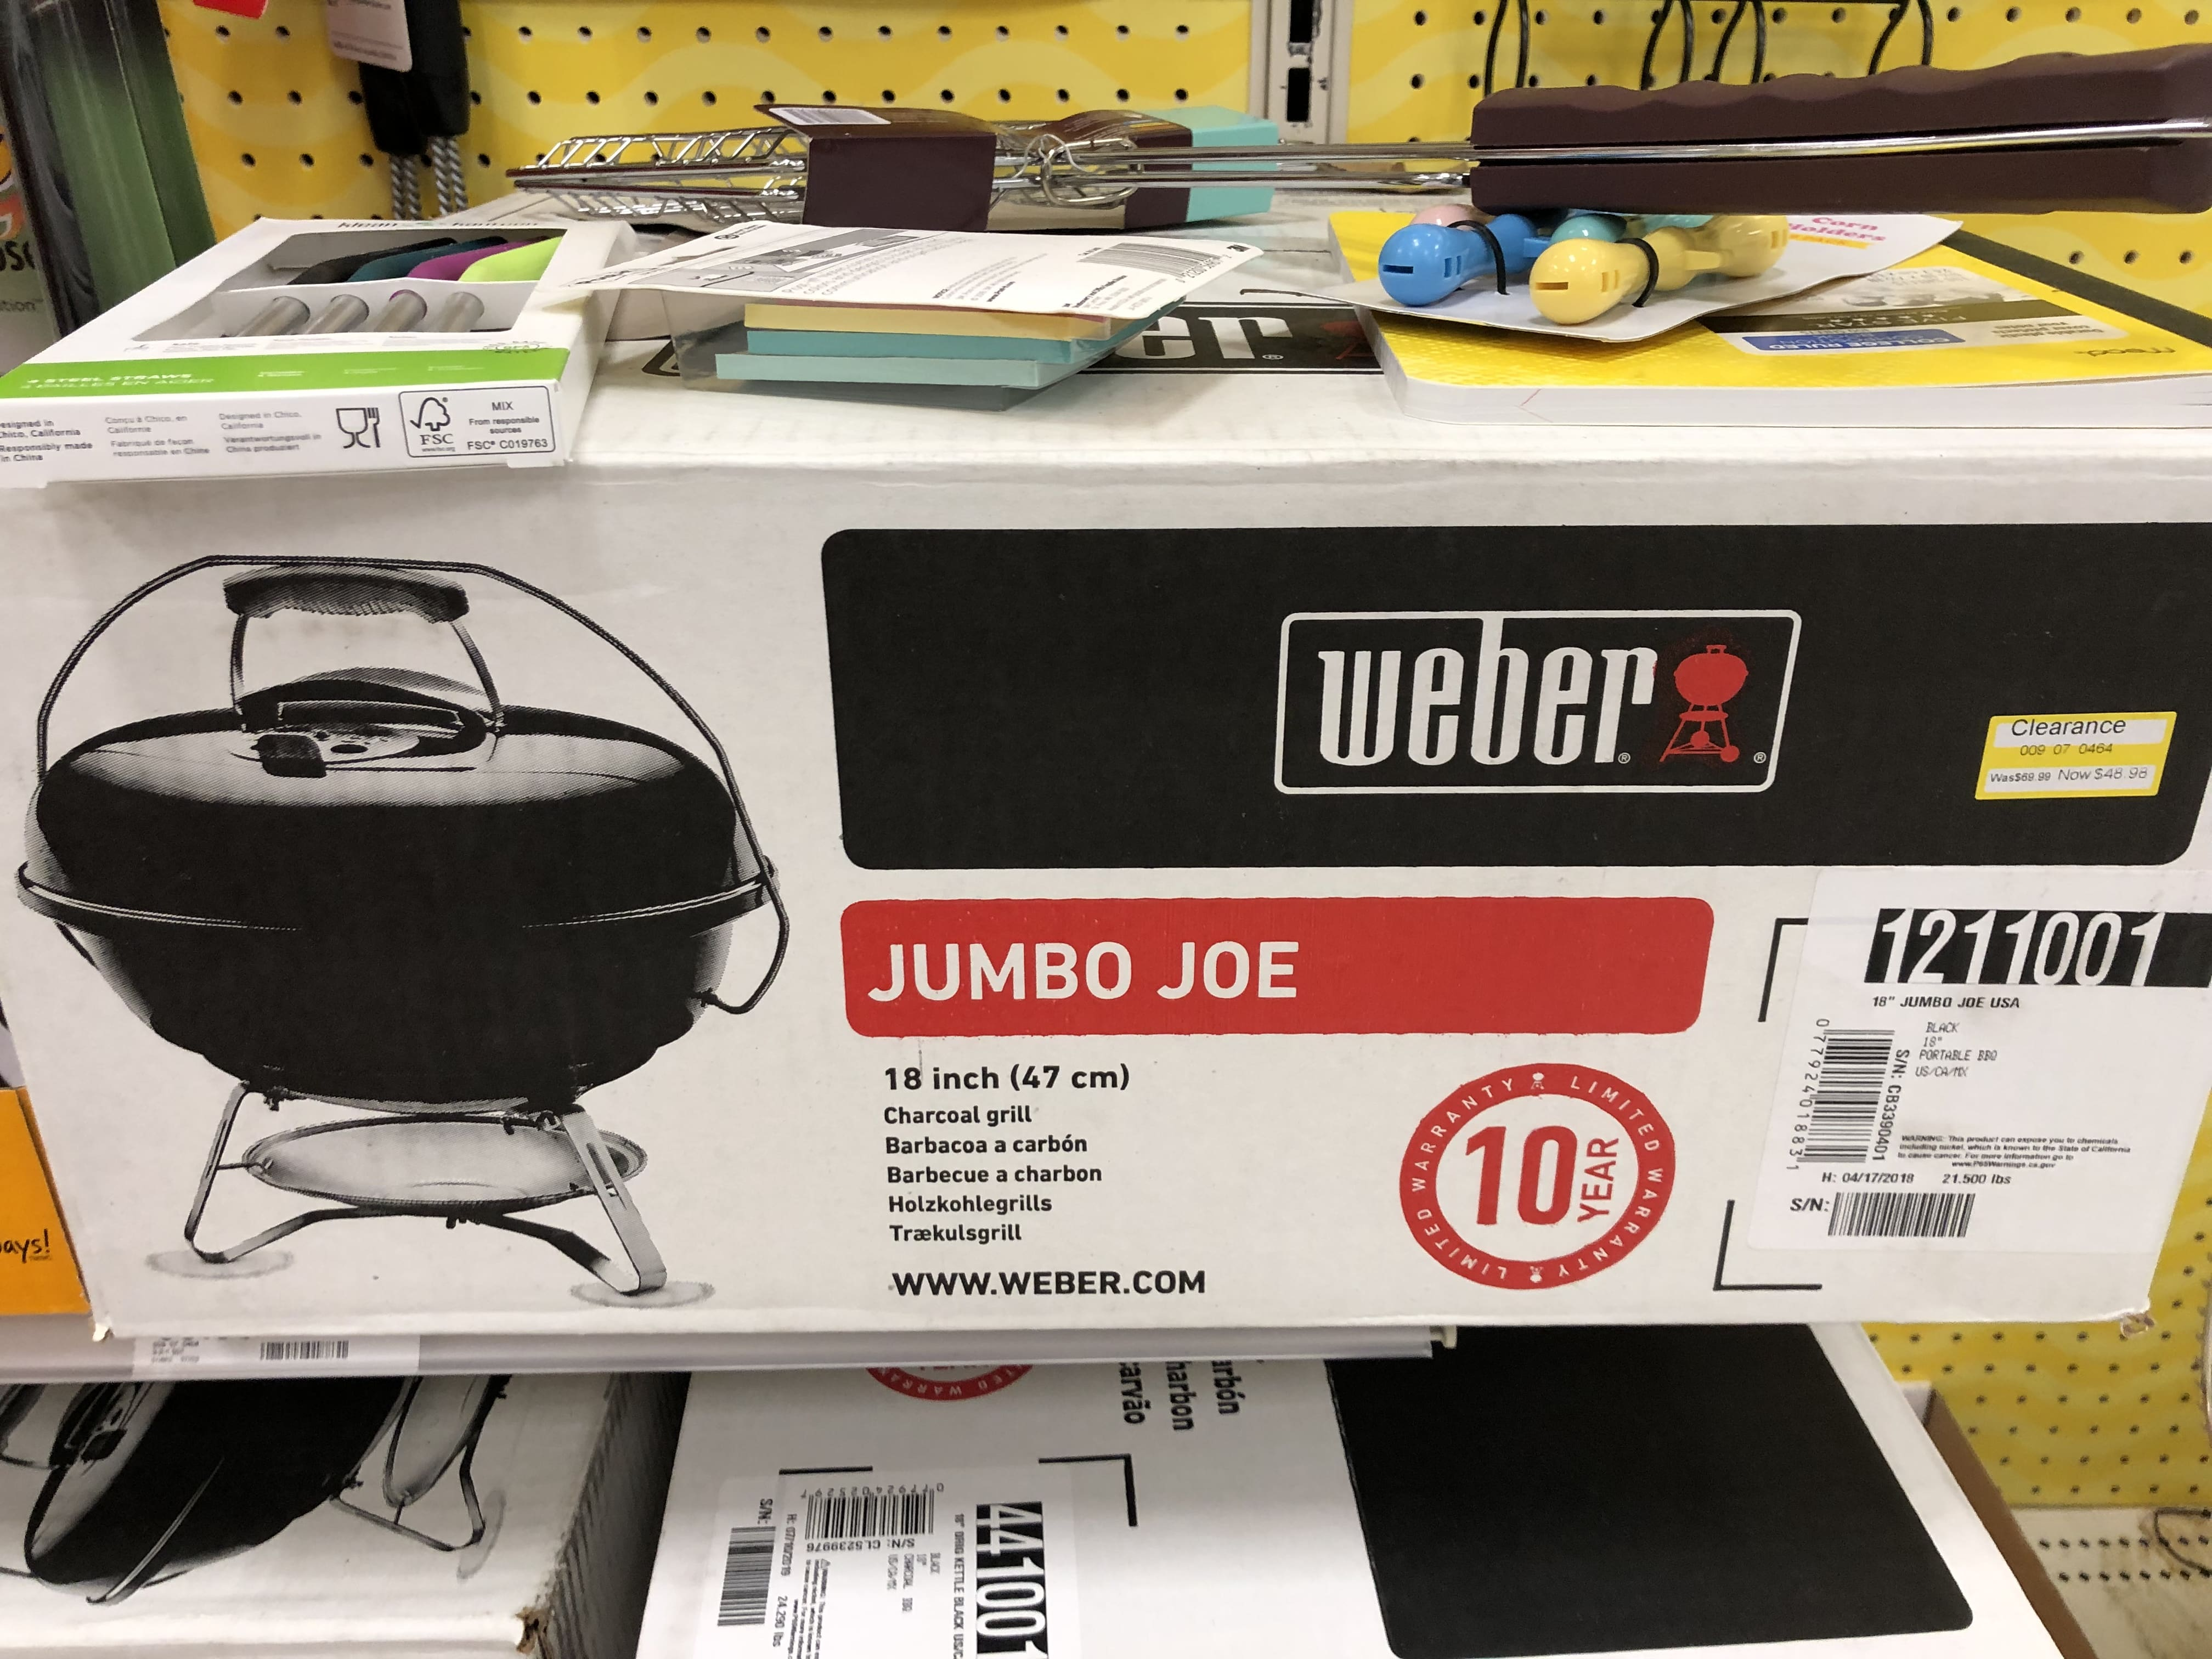 "Weber 18"" Jumbo Joe Charcoal Grill at Target $48.98 YMMV"